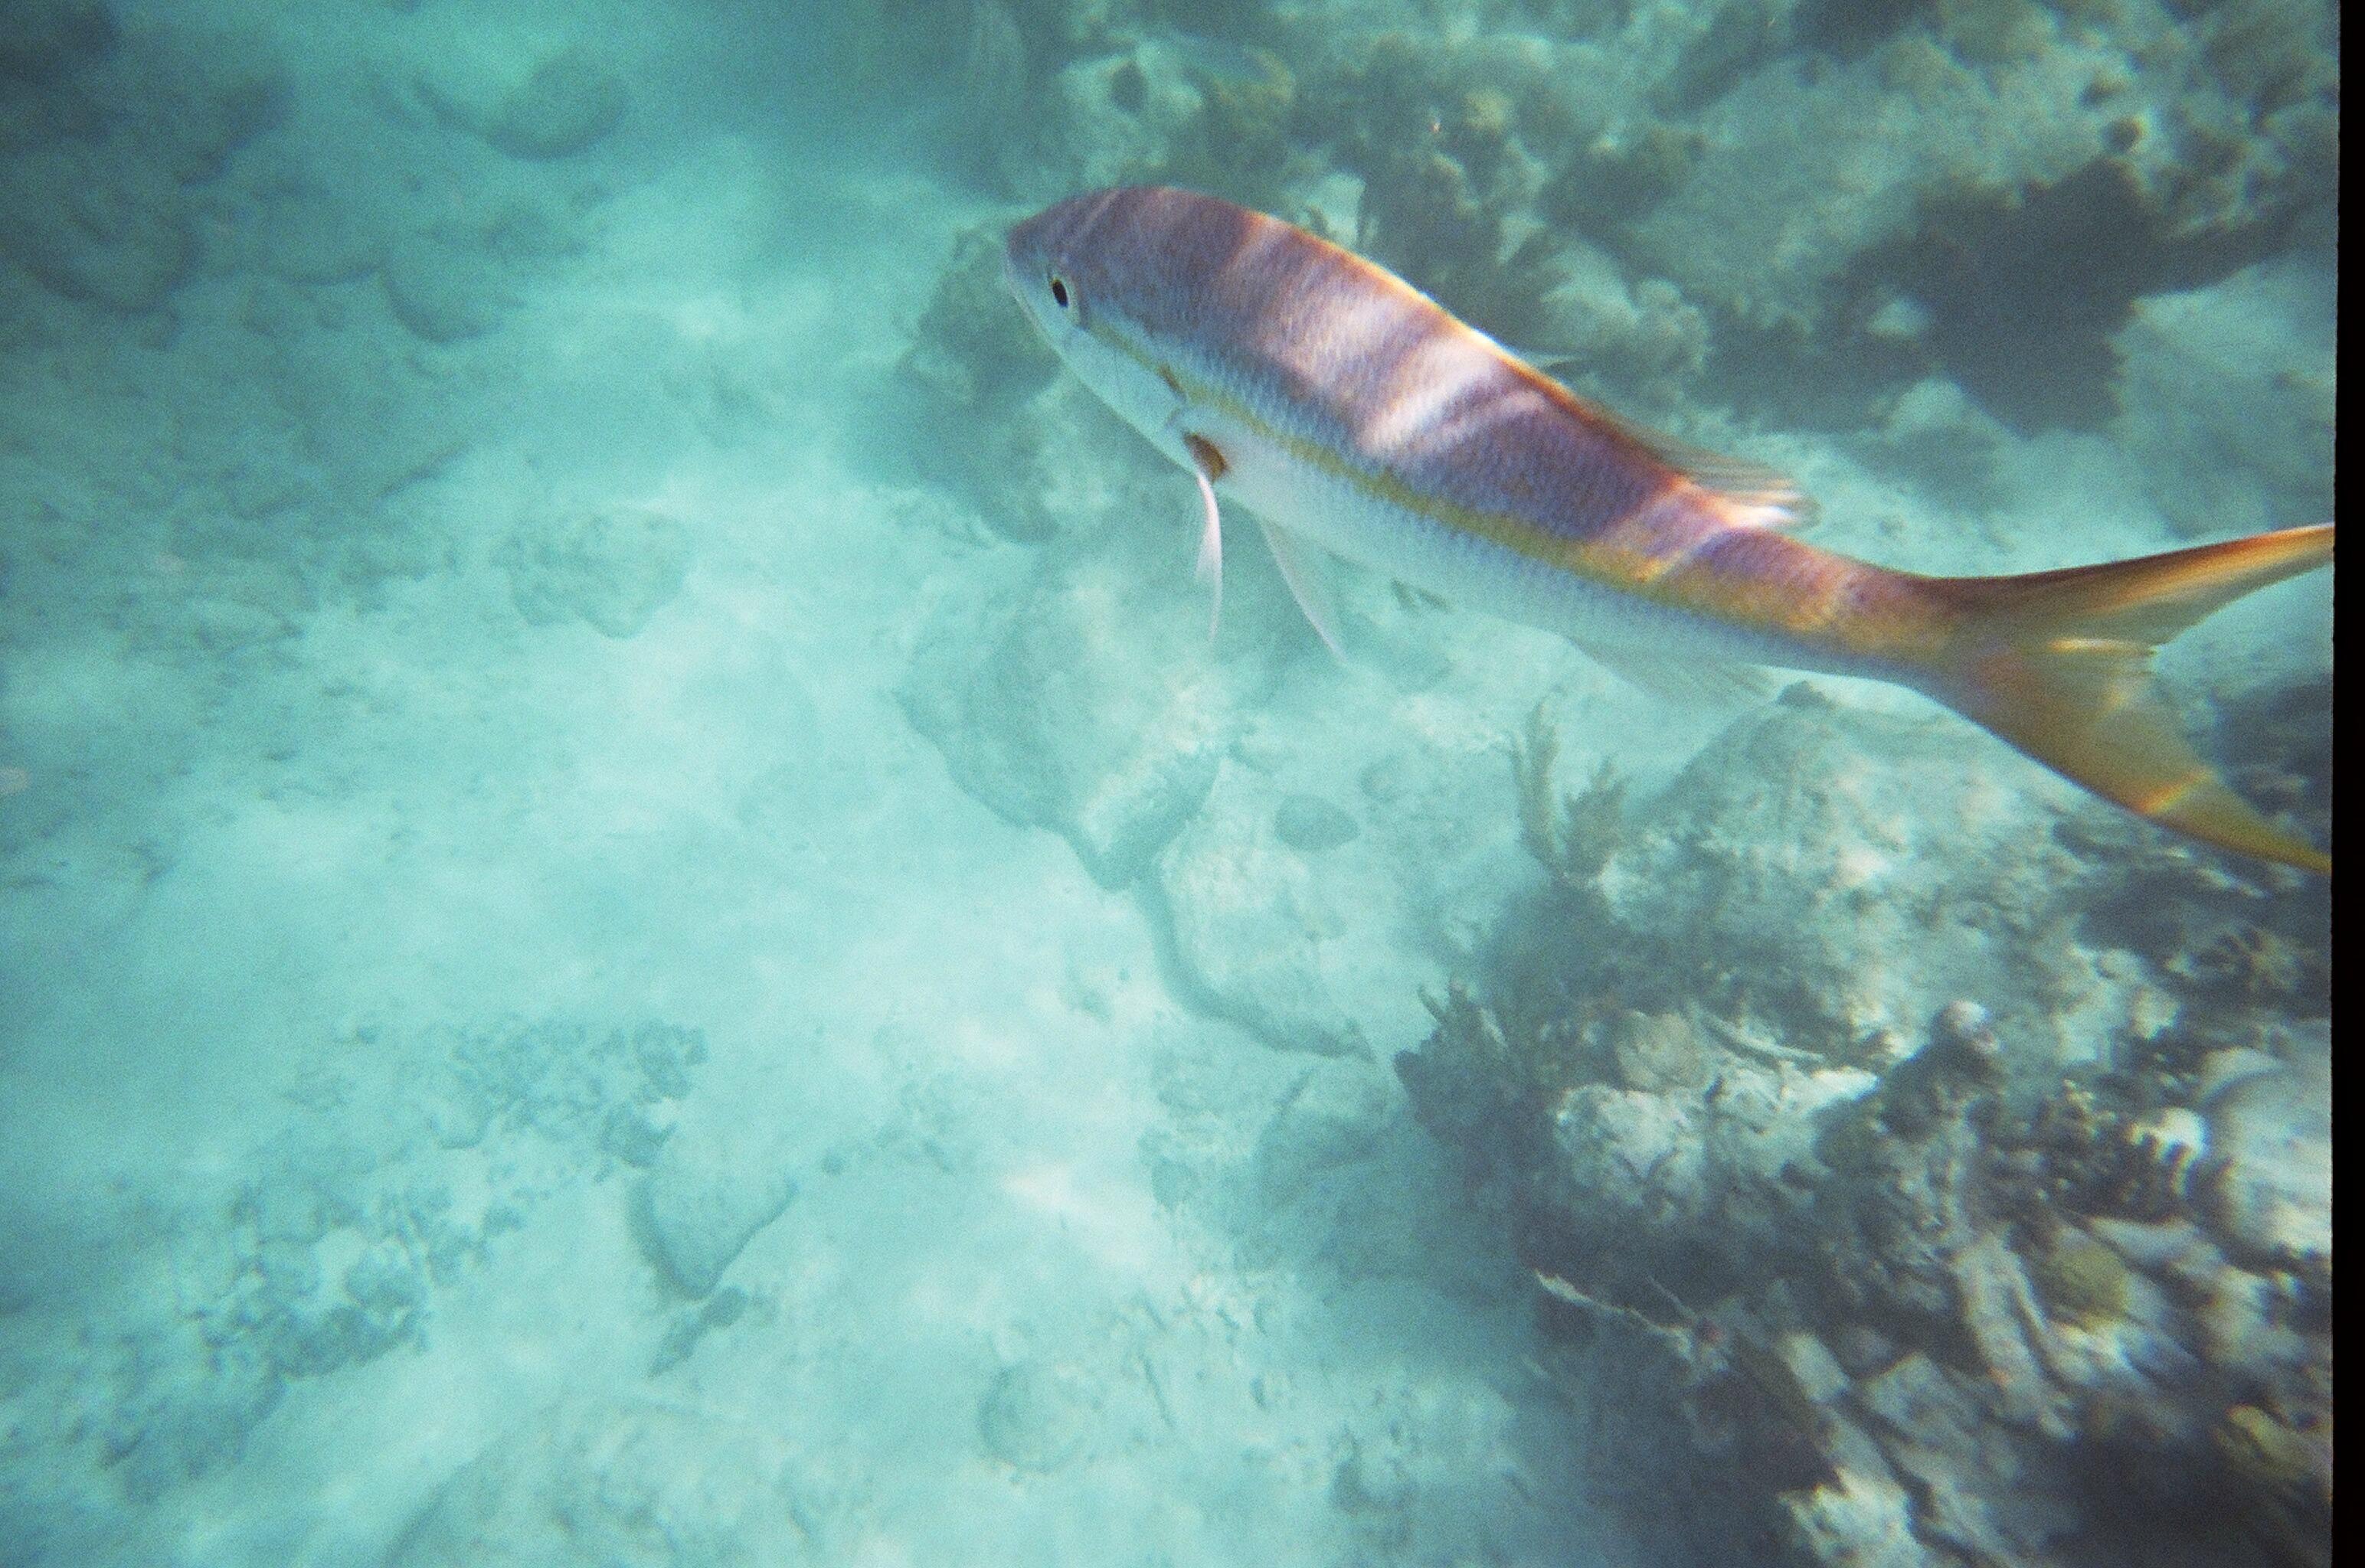 Yellowtail Snapper Trunk Bay, St. John, USVI